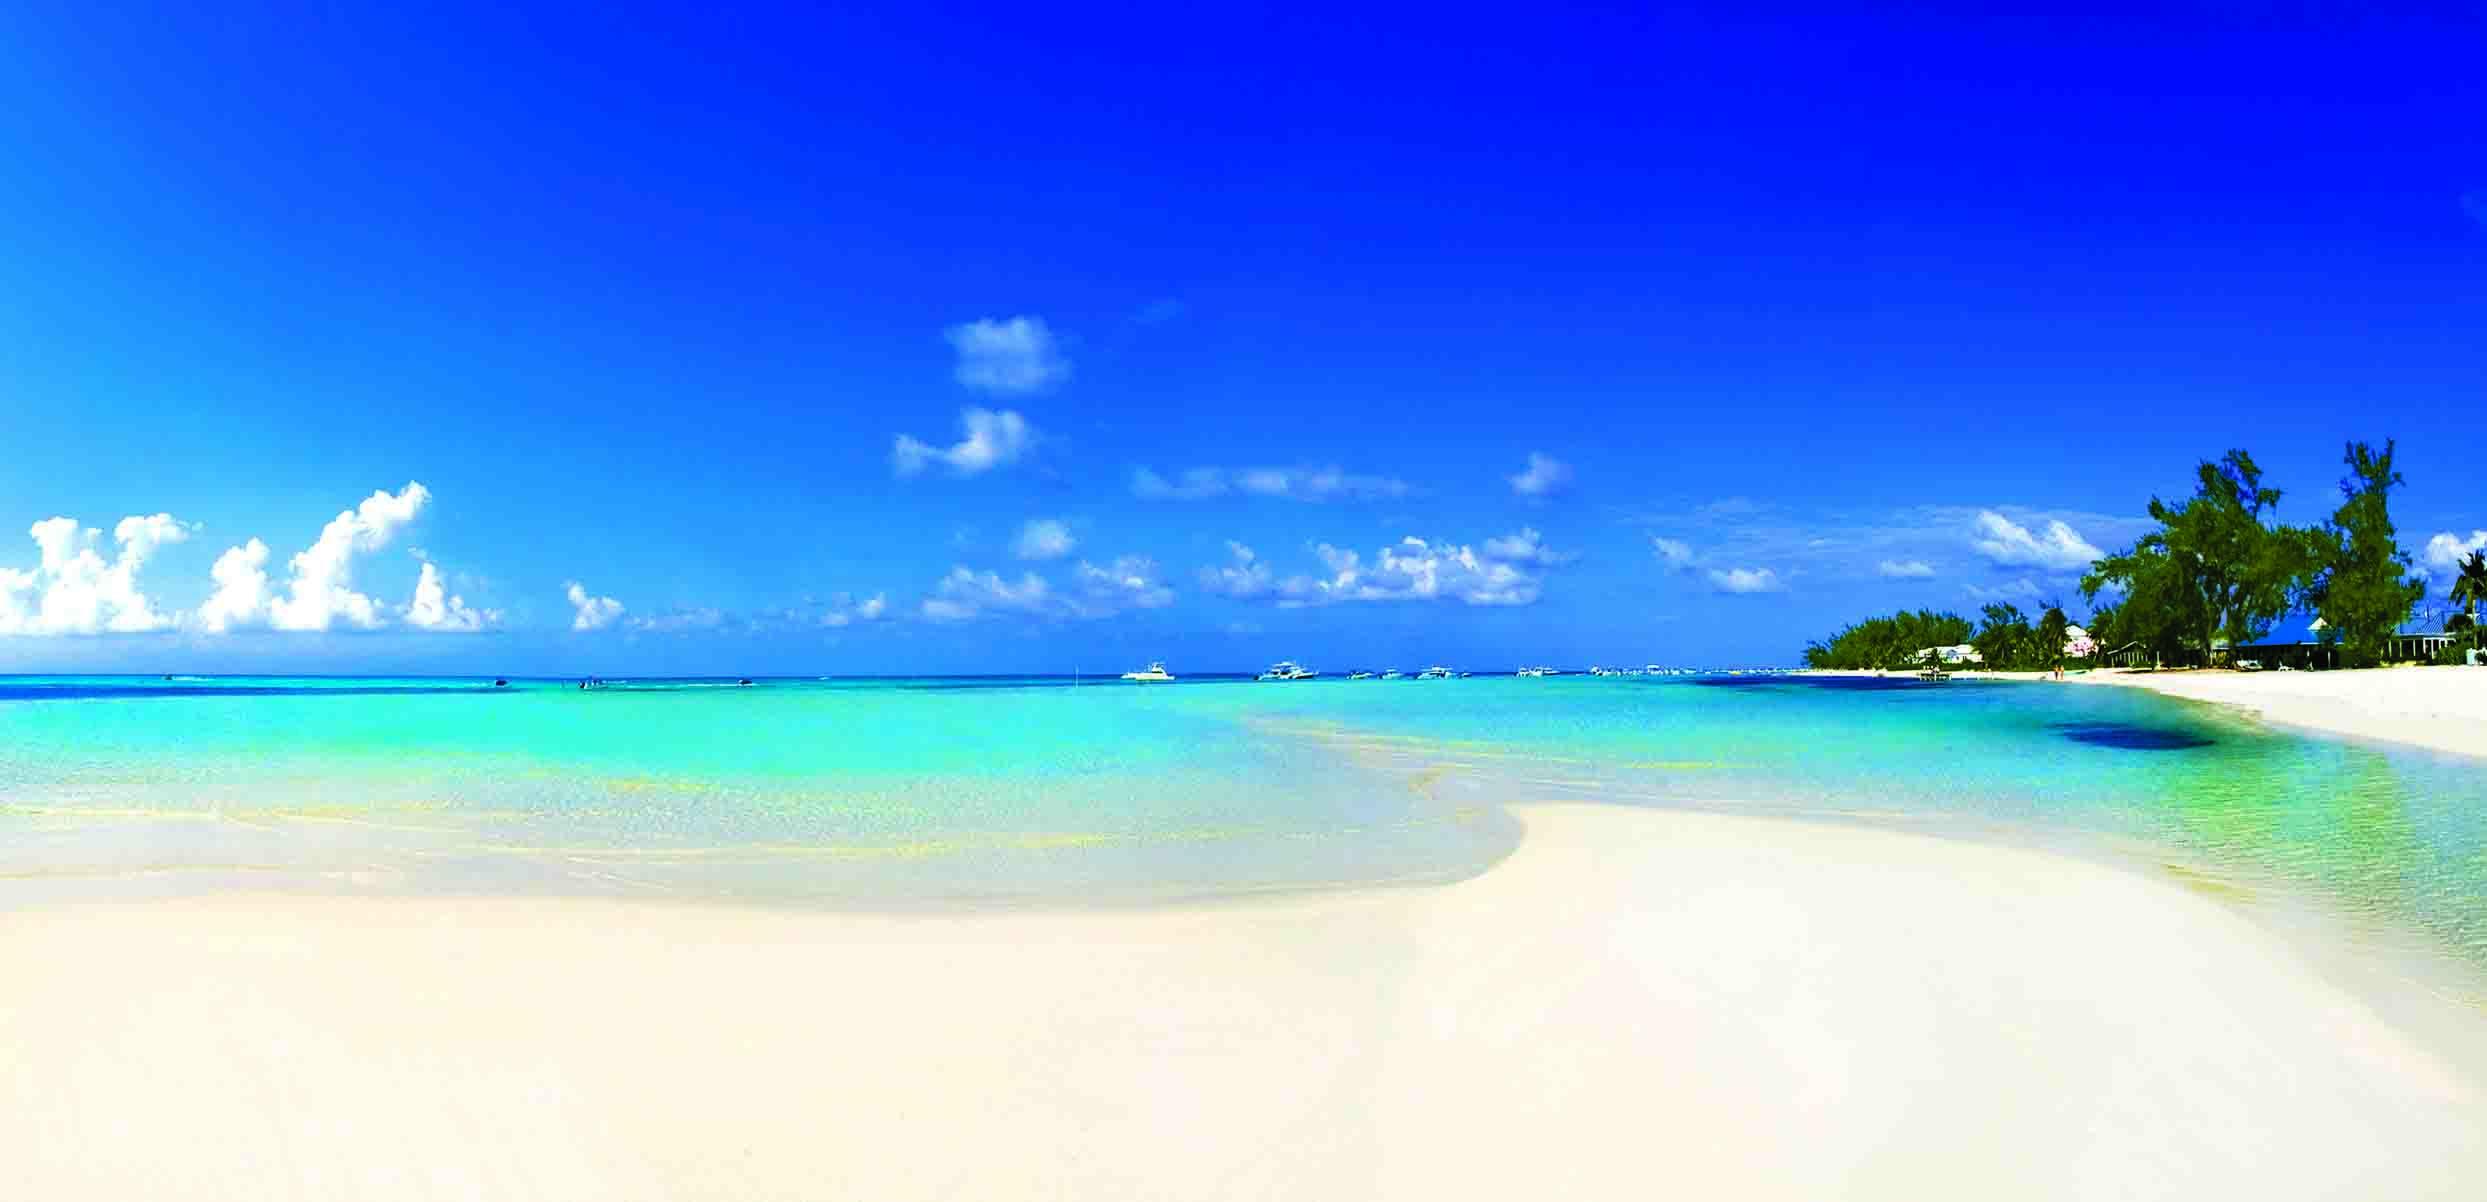 cayman-yacht-charter-cayman-yacht-rental-cayman-boat-charter-cayman-boat-rental-cayman-sailing-charter-beaches